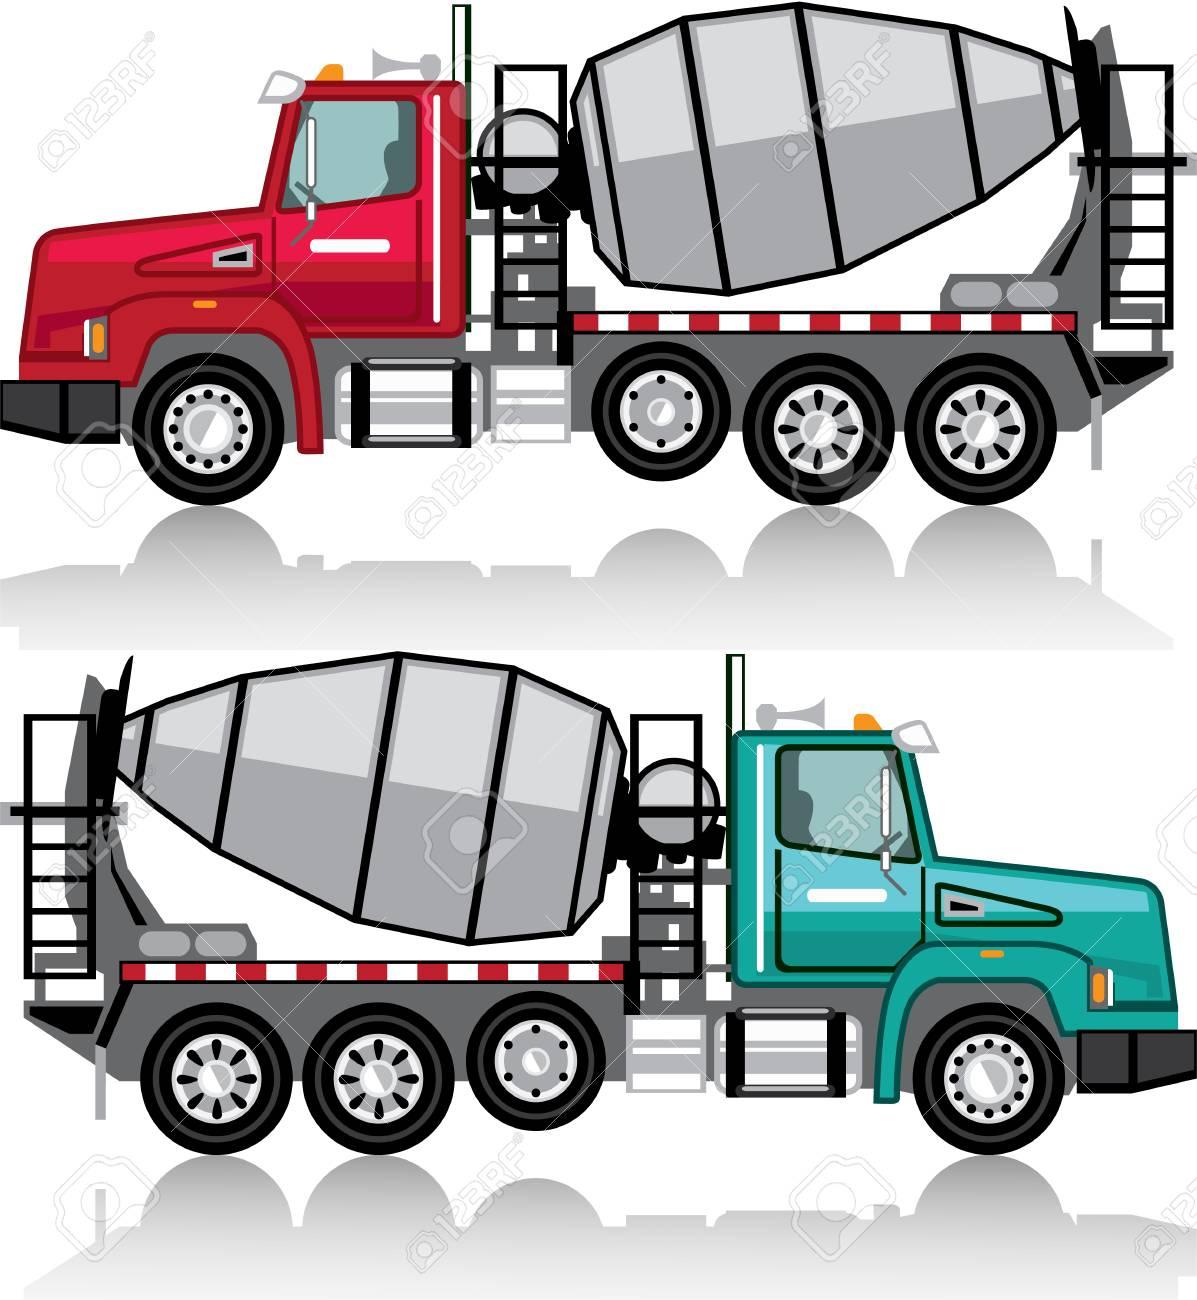 cement mixer vector illustration clip art image file royalty free rh 123rf com concrete clipart free clipart concrete truck